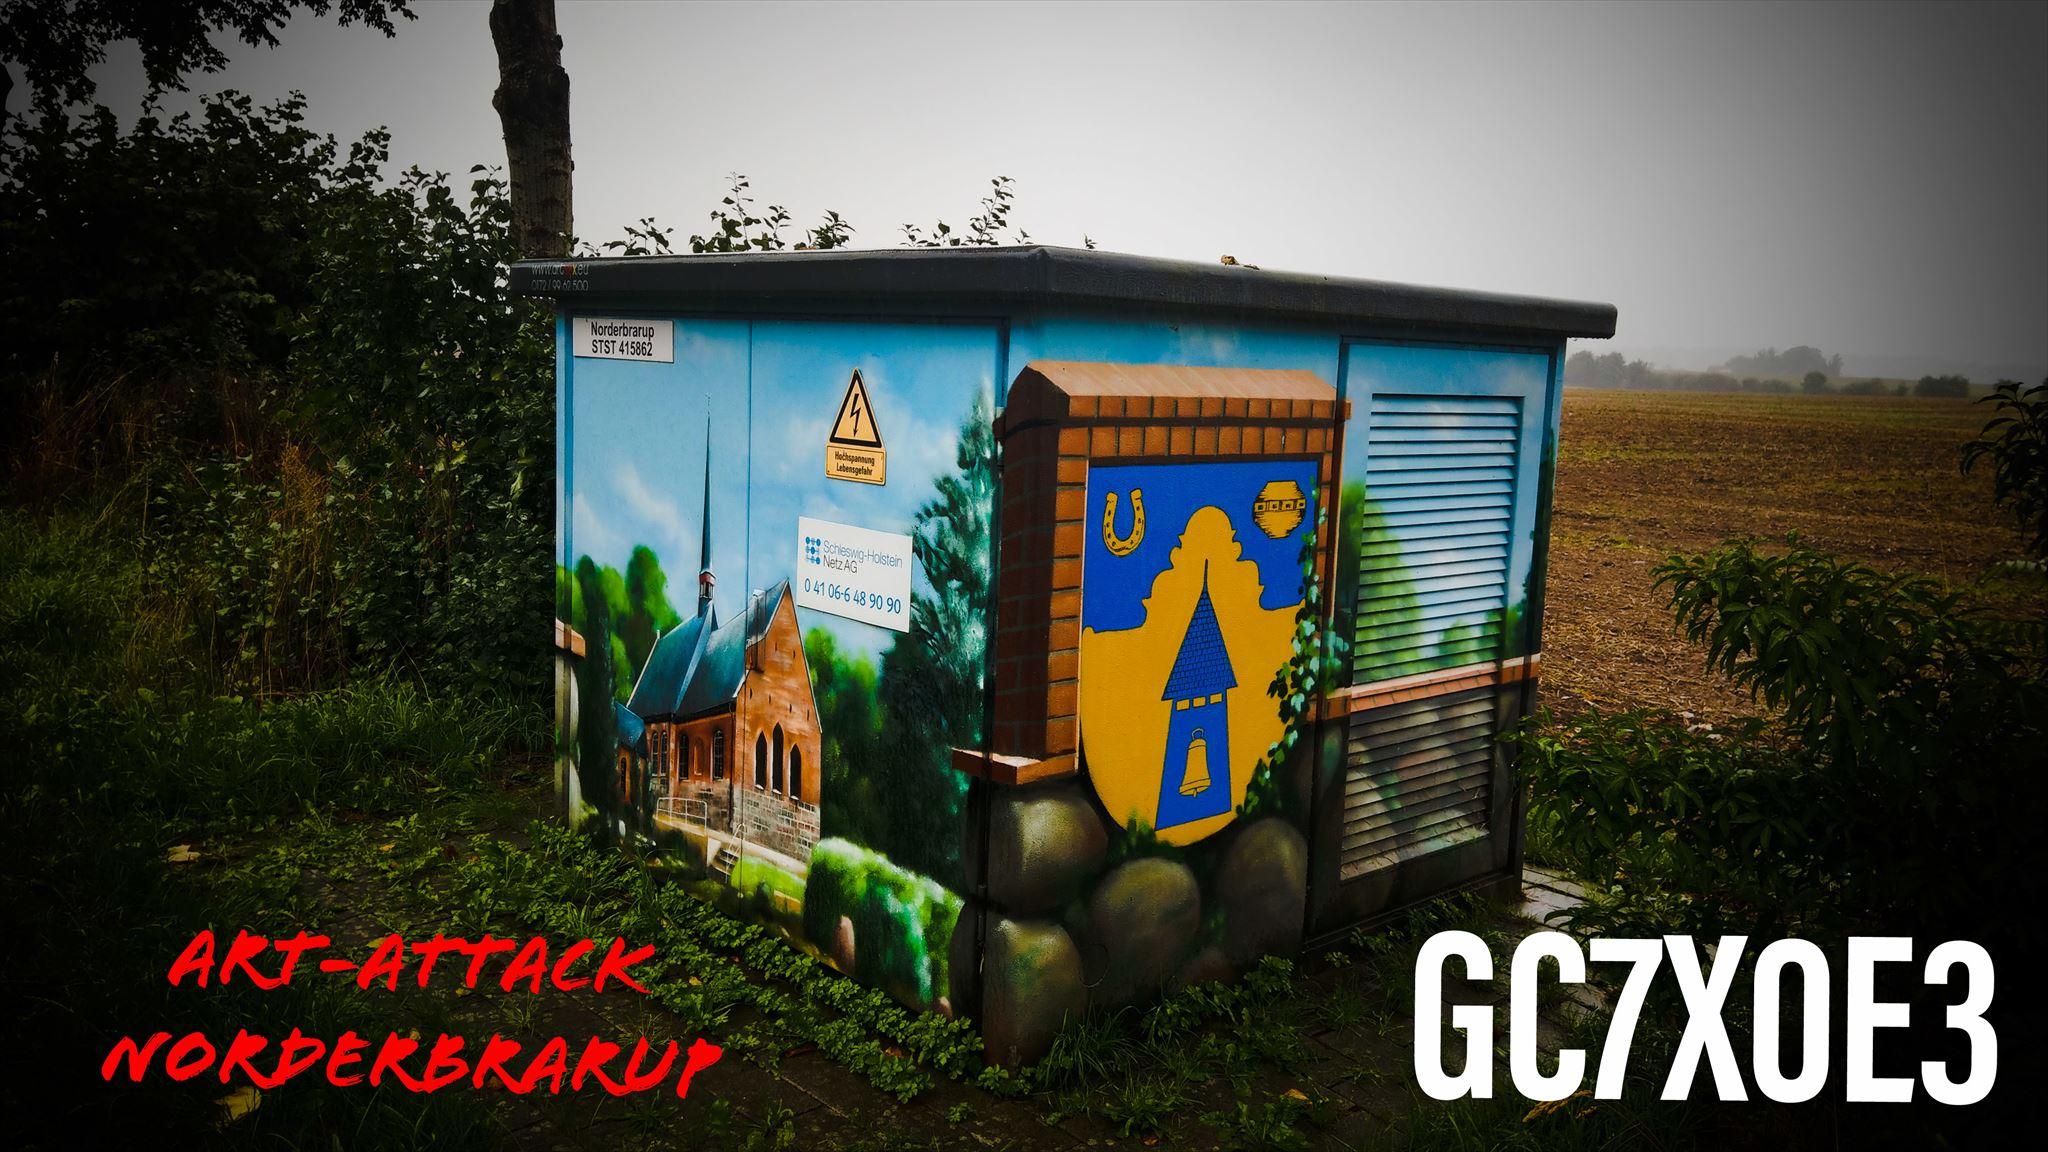 Art-Attack Norderbrarup